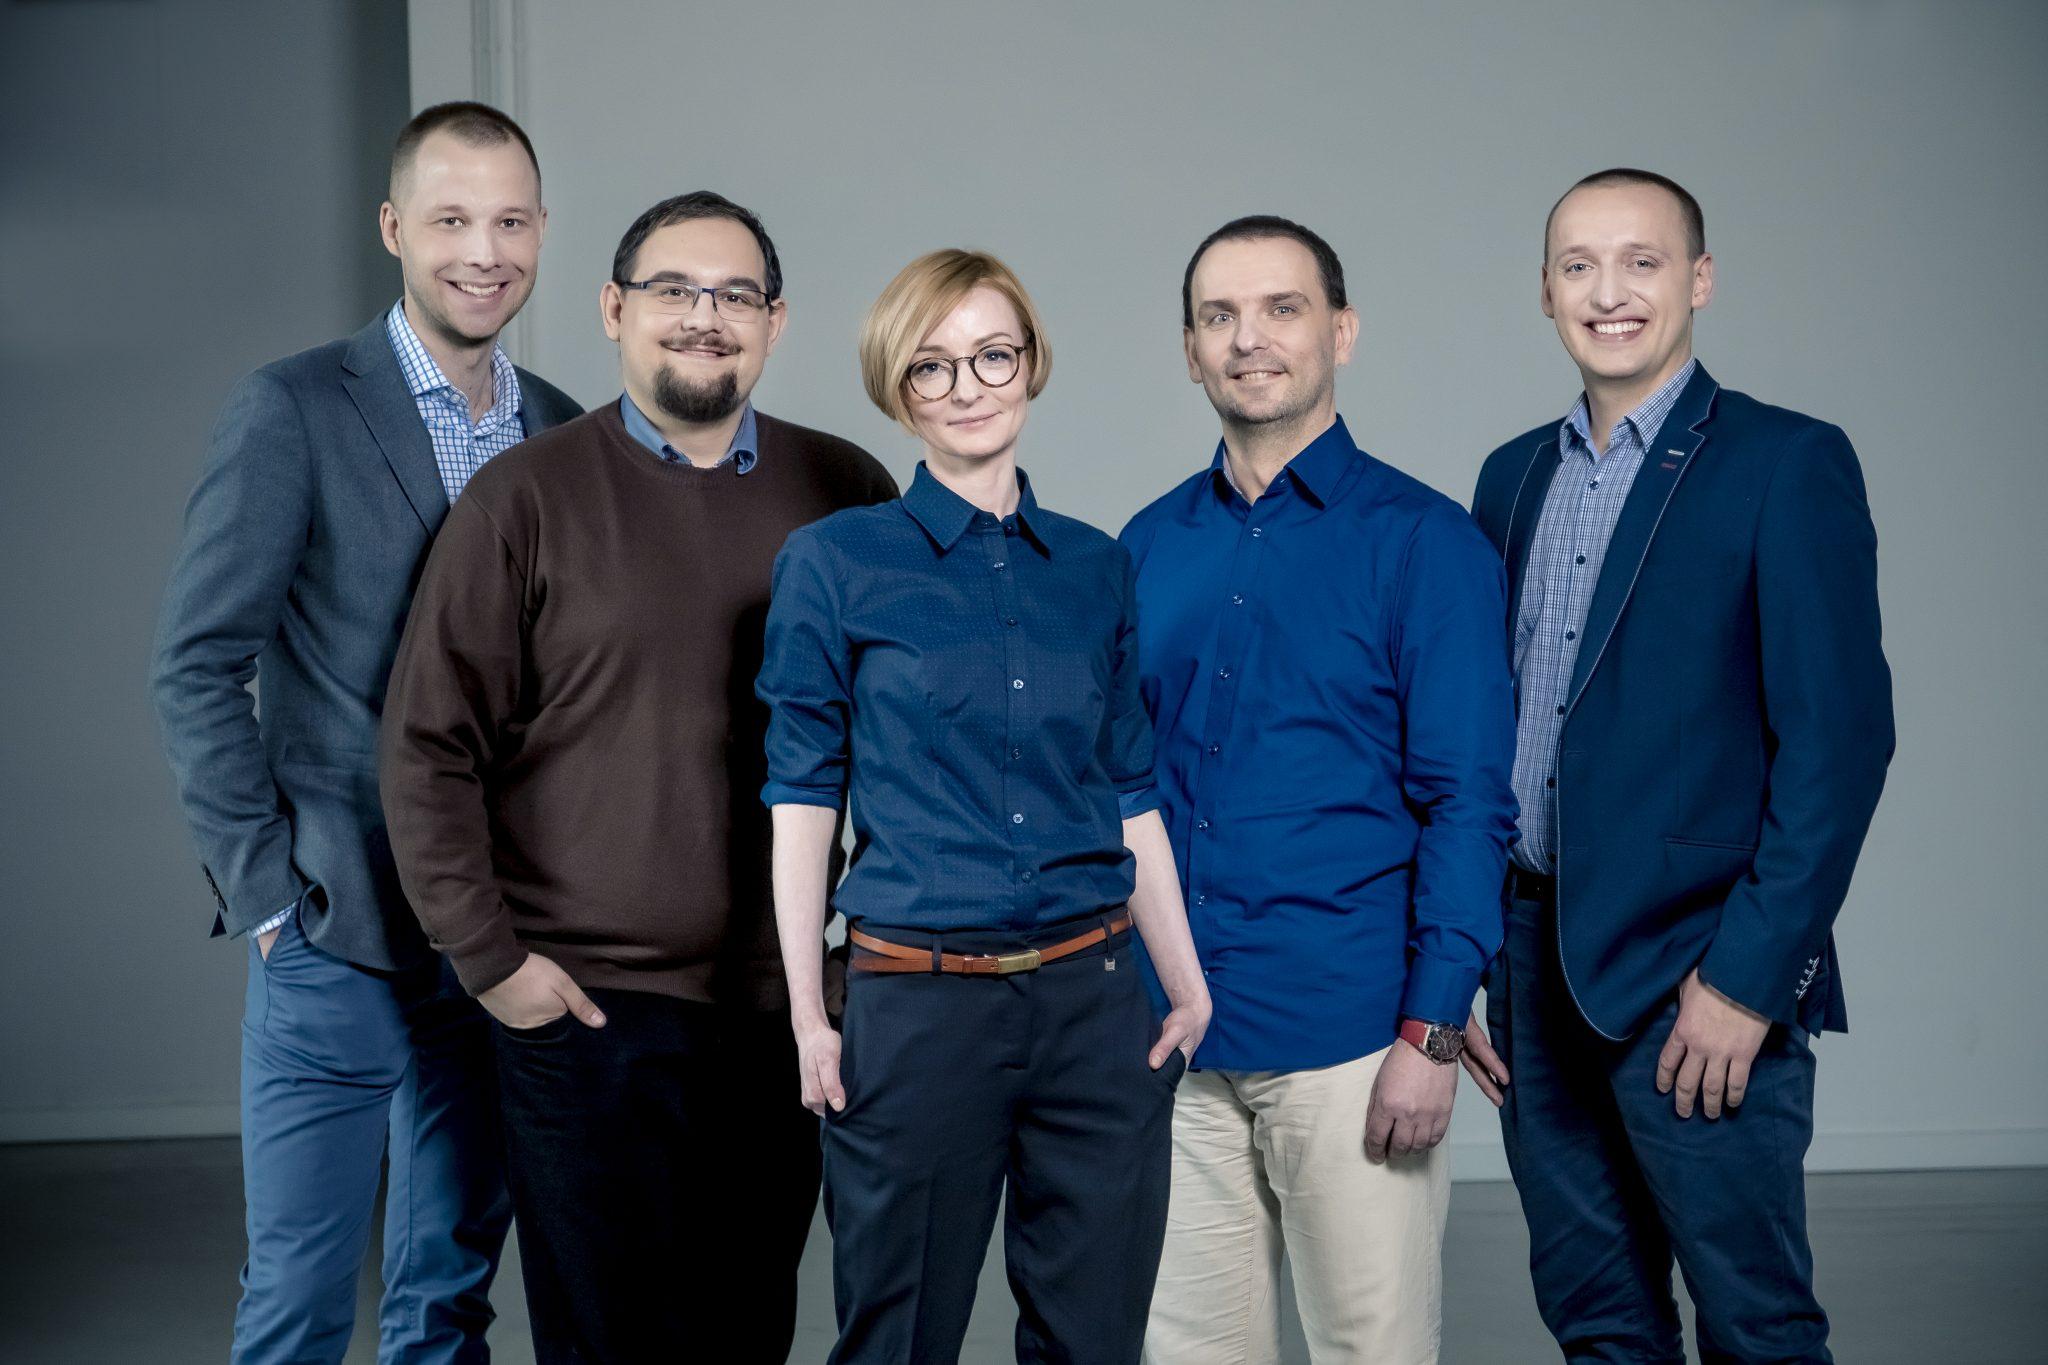 StethoMe, Poland health company